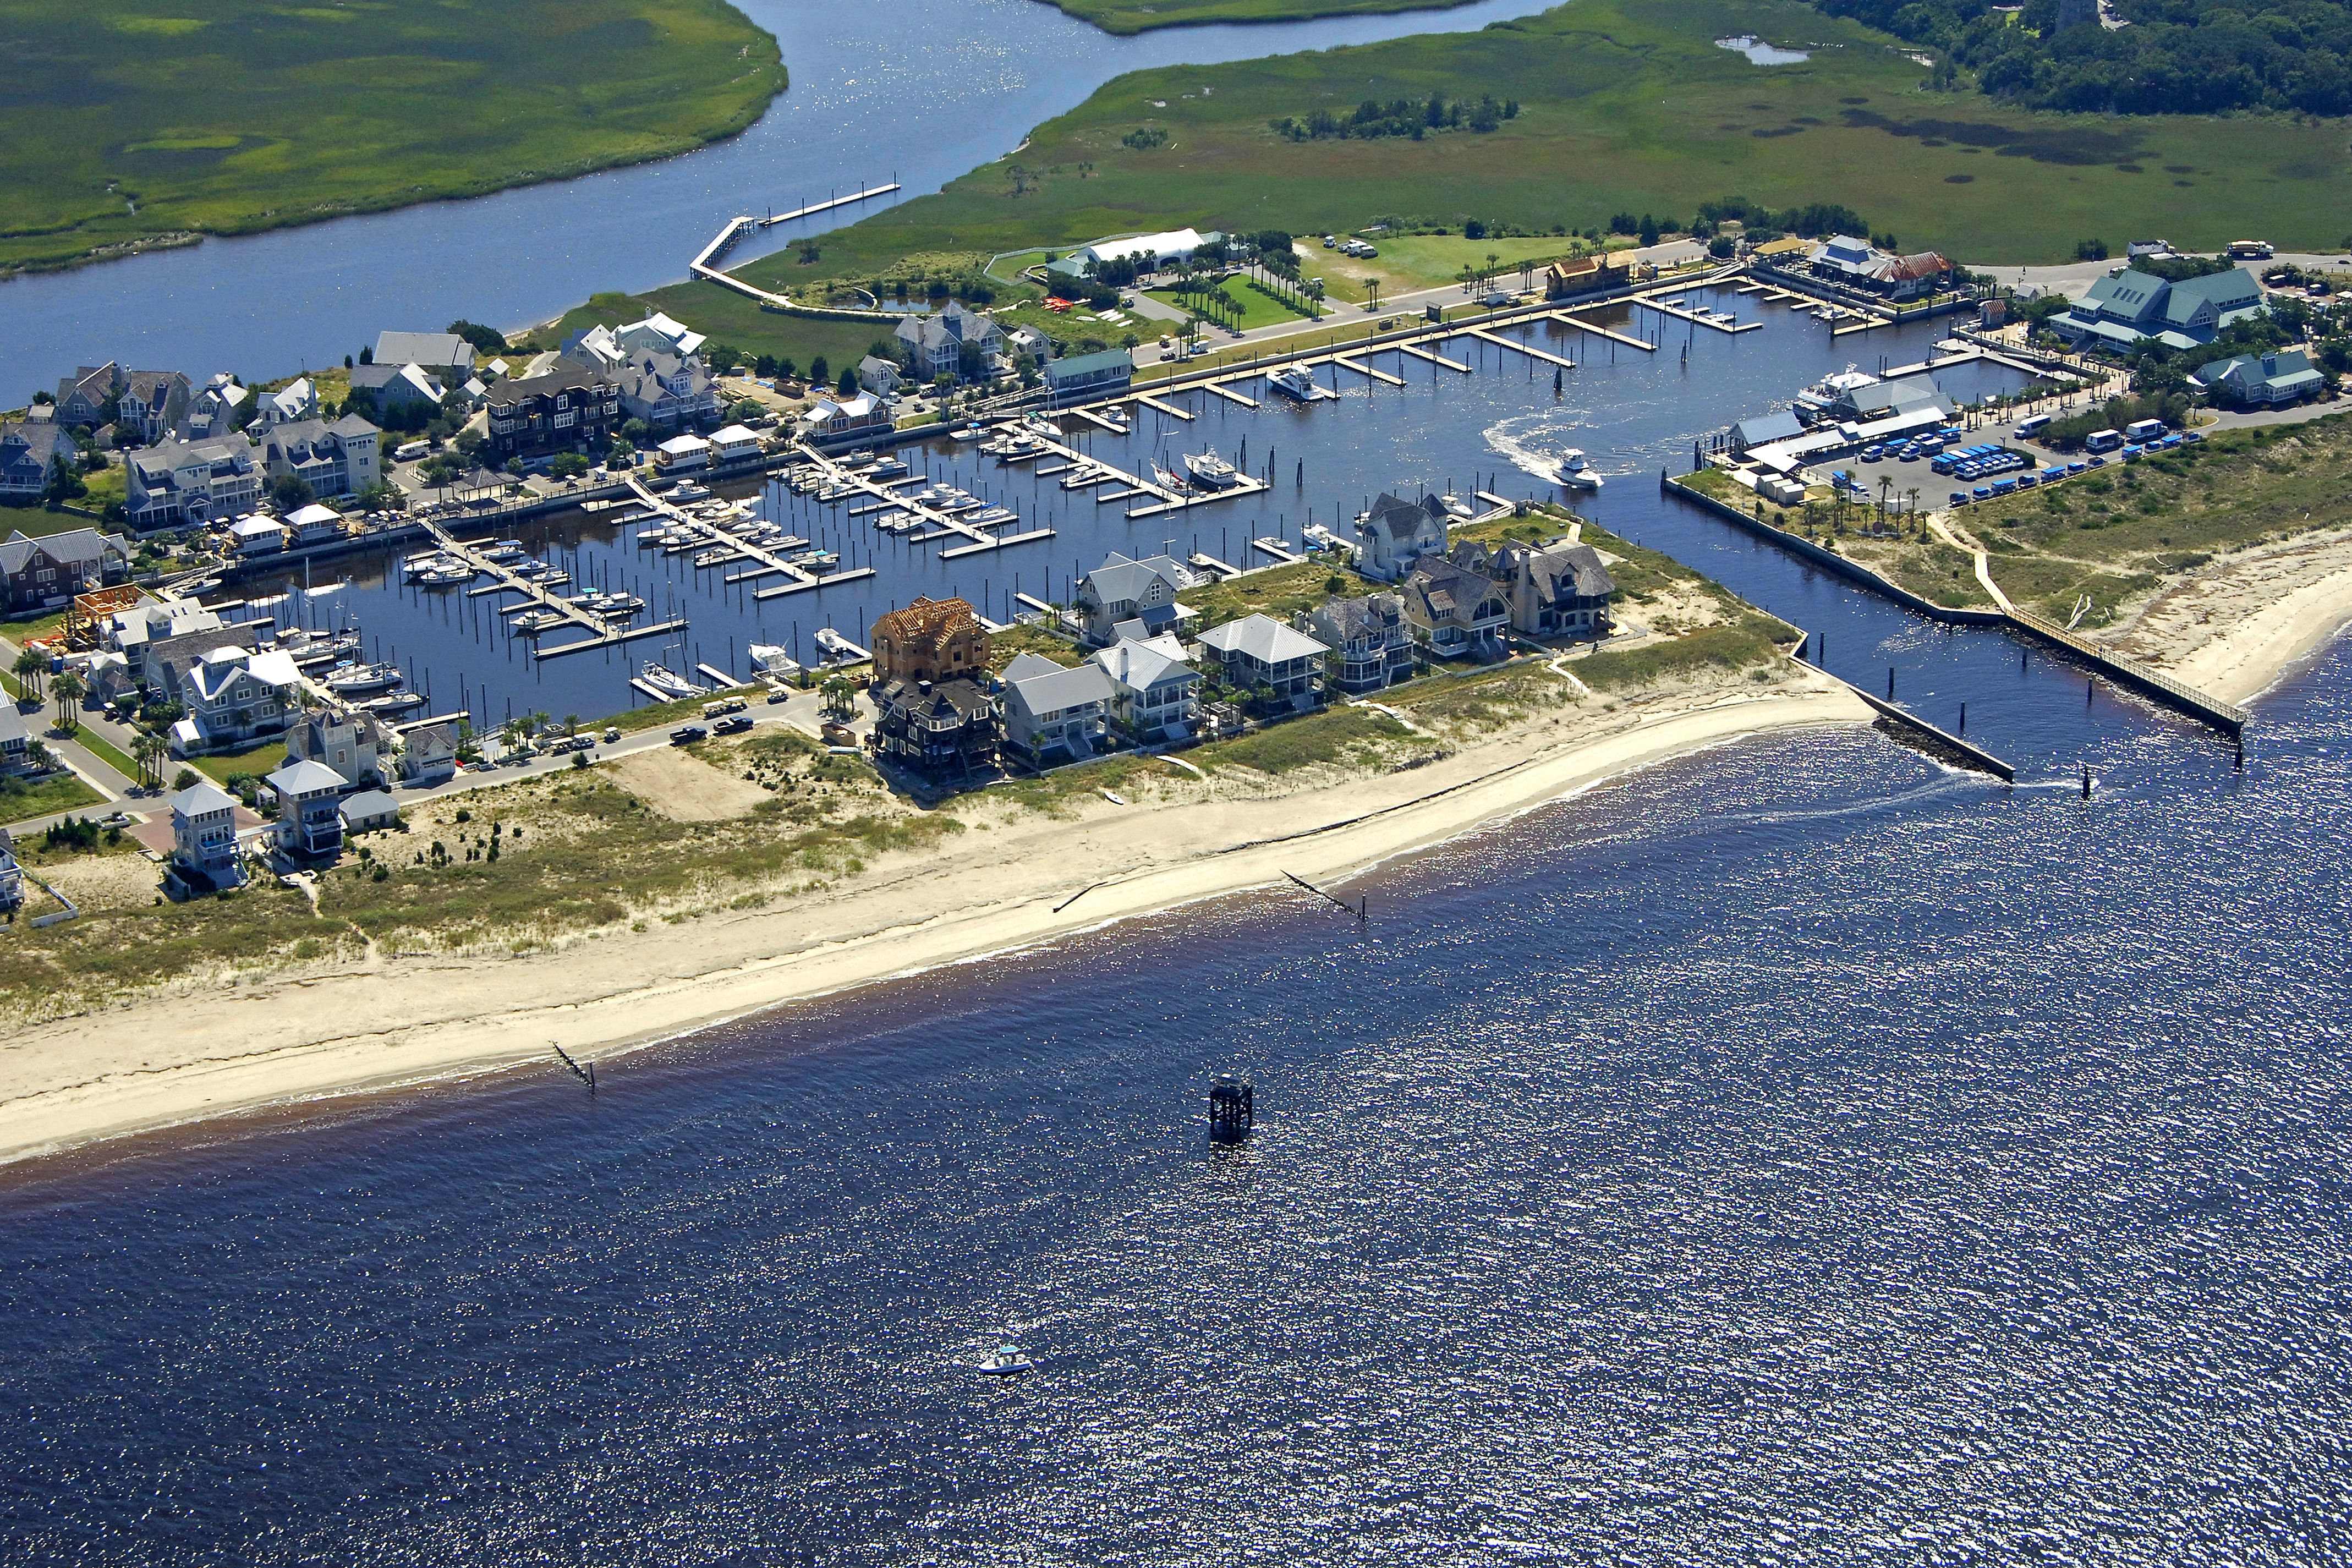 Island Marina Carolina Beach